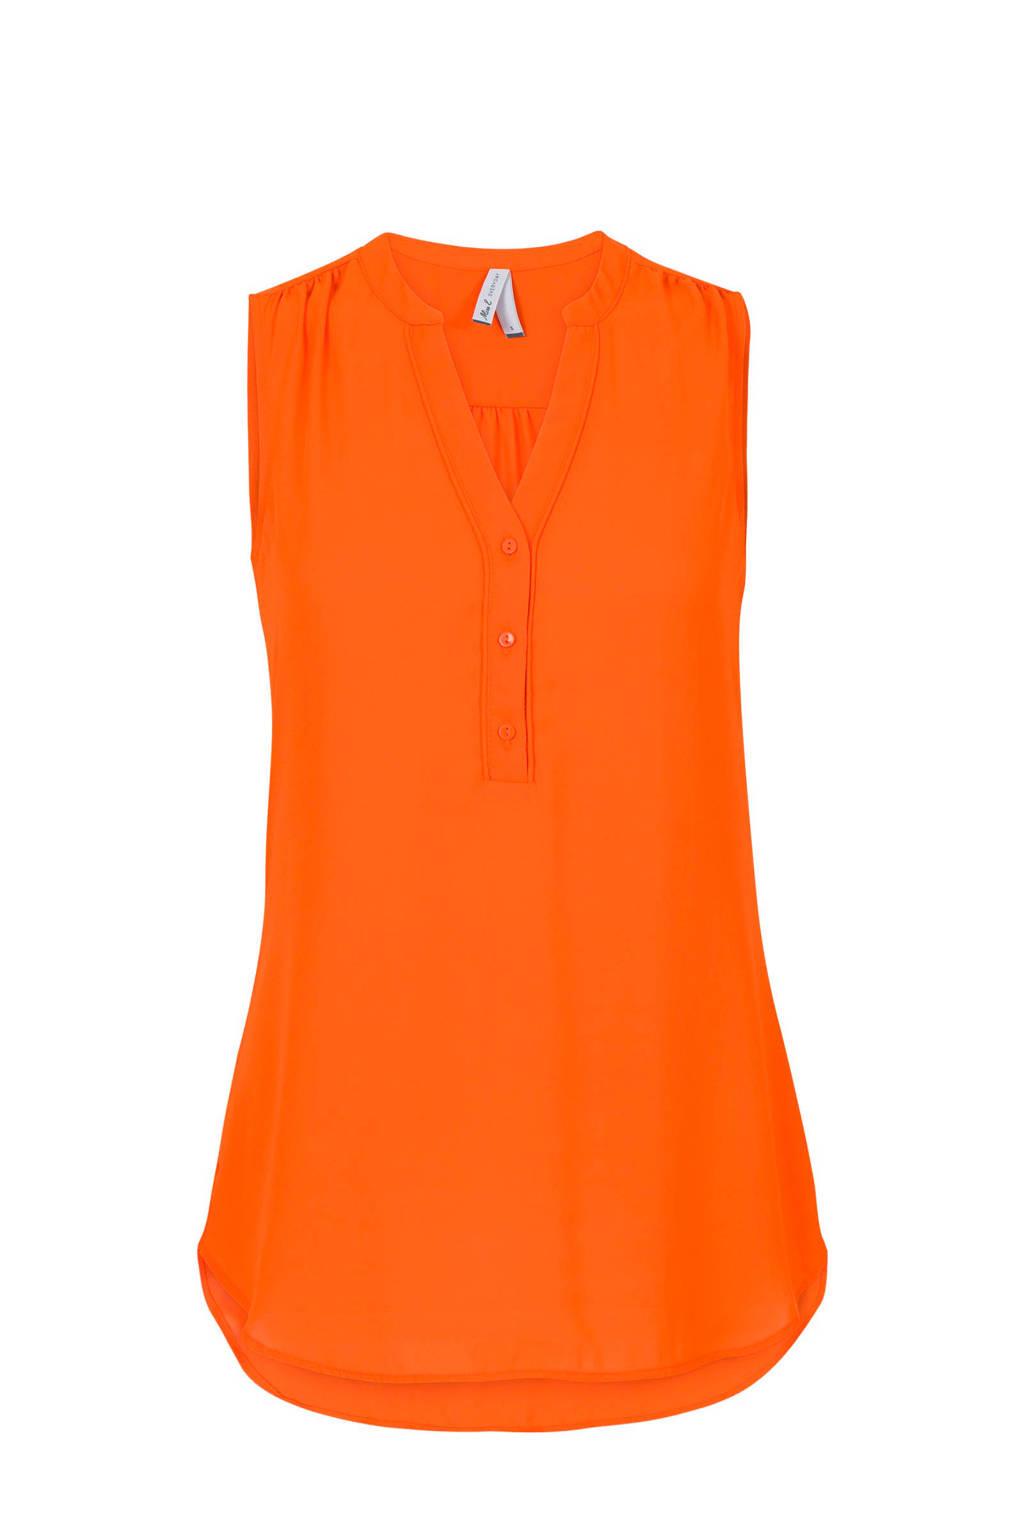 Miss Etam Regulier mouwloze top oranje, Oranje